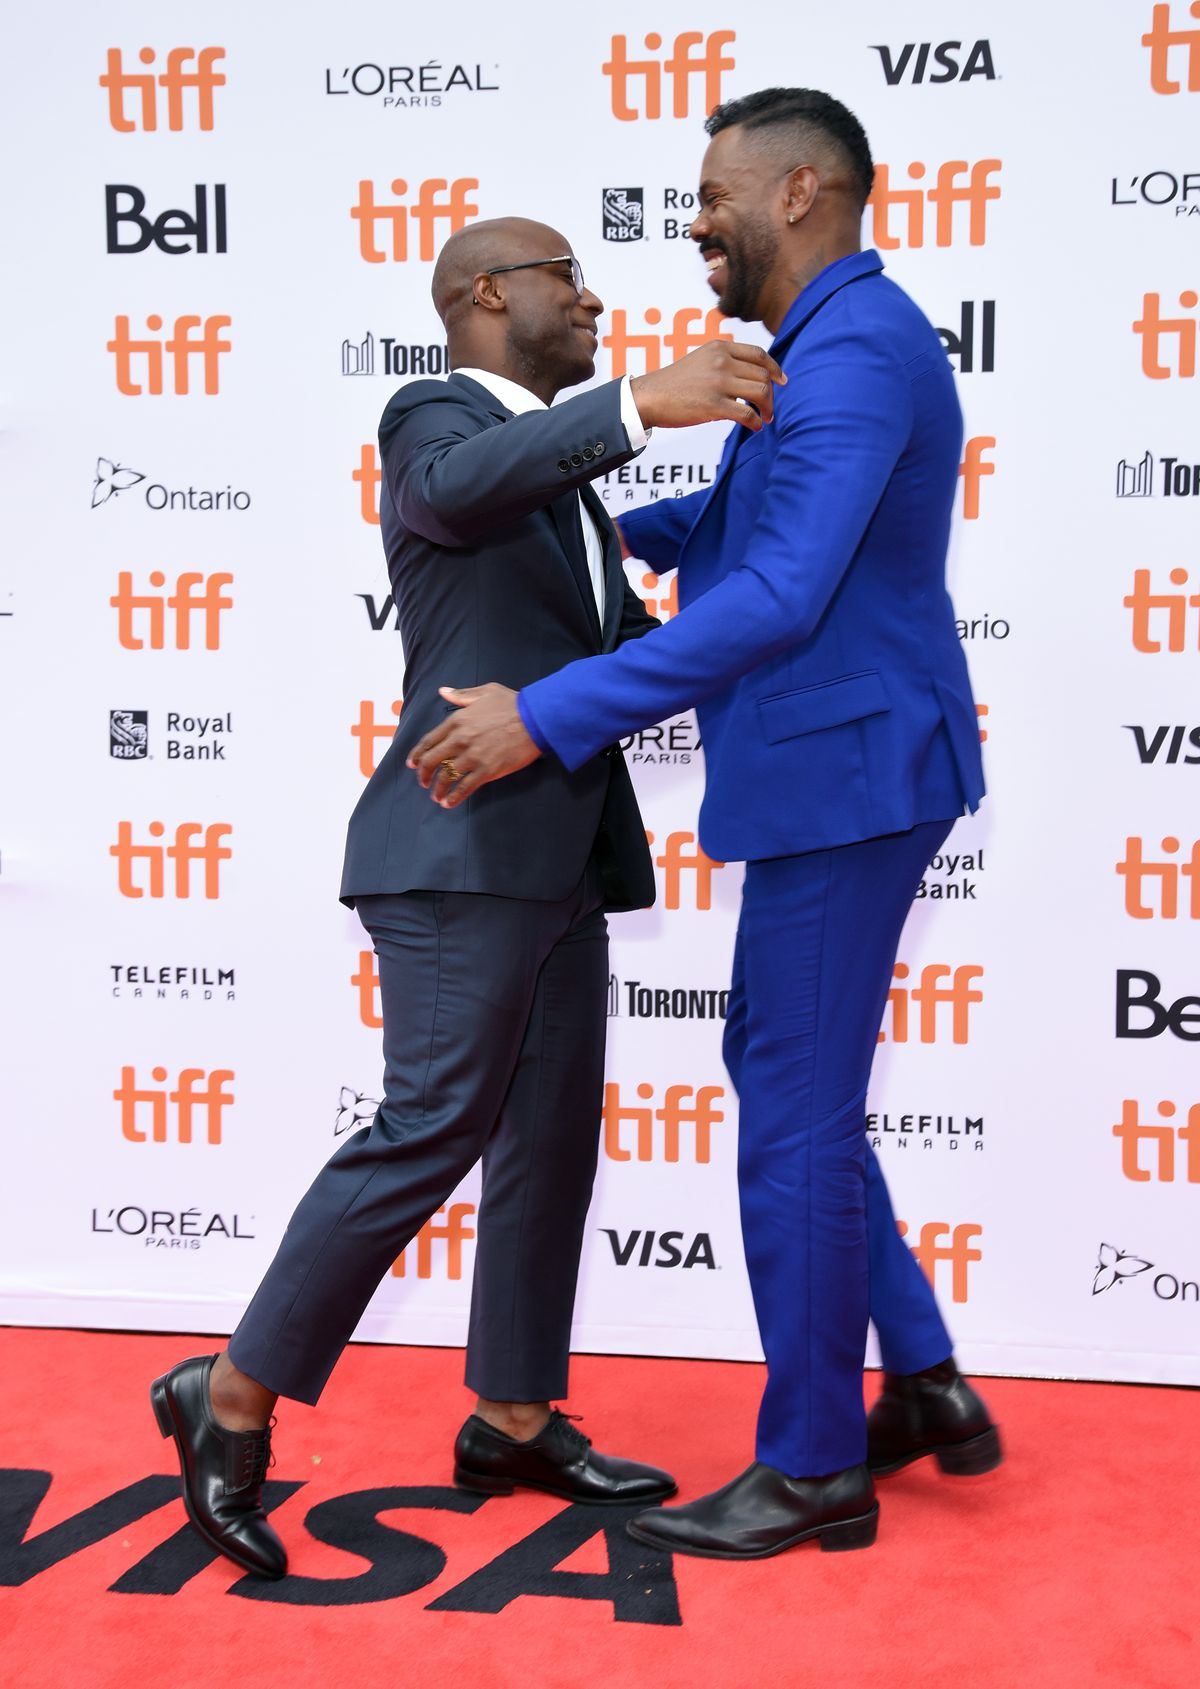 2018 Toronto International Film Festival - 'If Beale Street Could Talk' Premiere - Arrivals